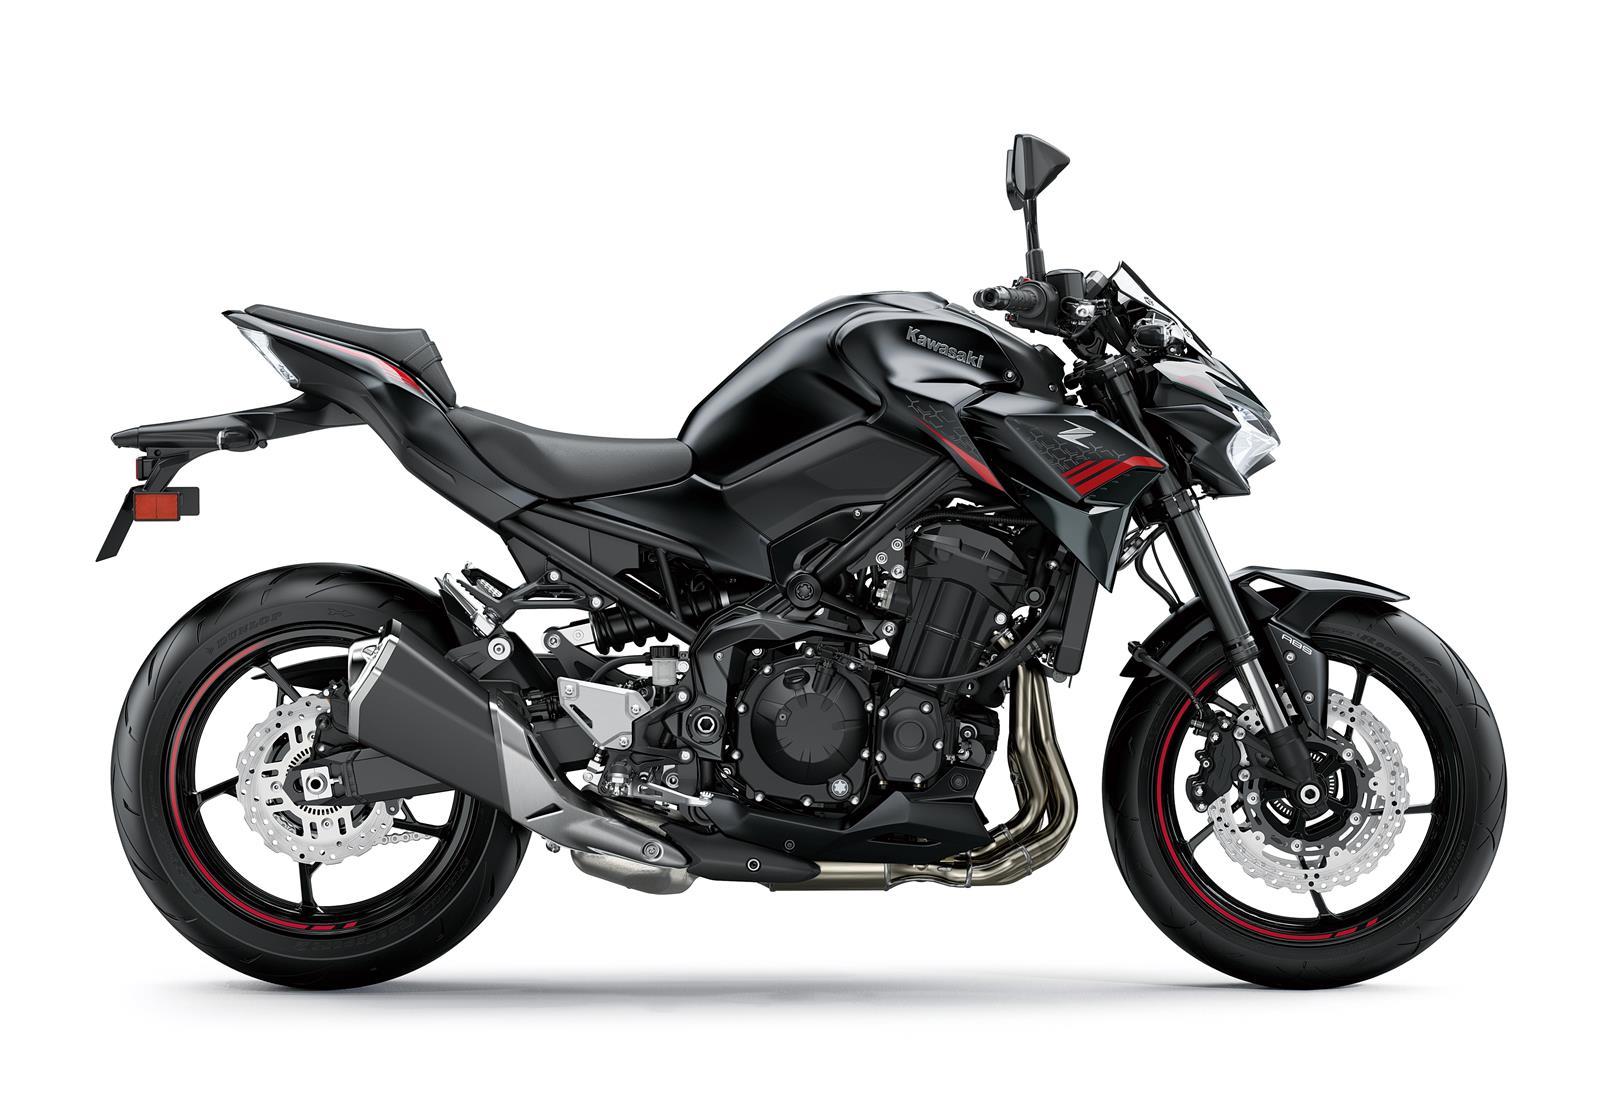 Мотоцикл KAWASAKI Z900 - Черный '2020